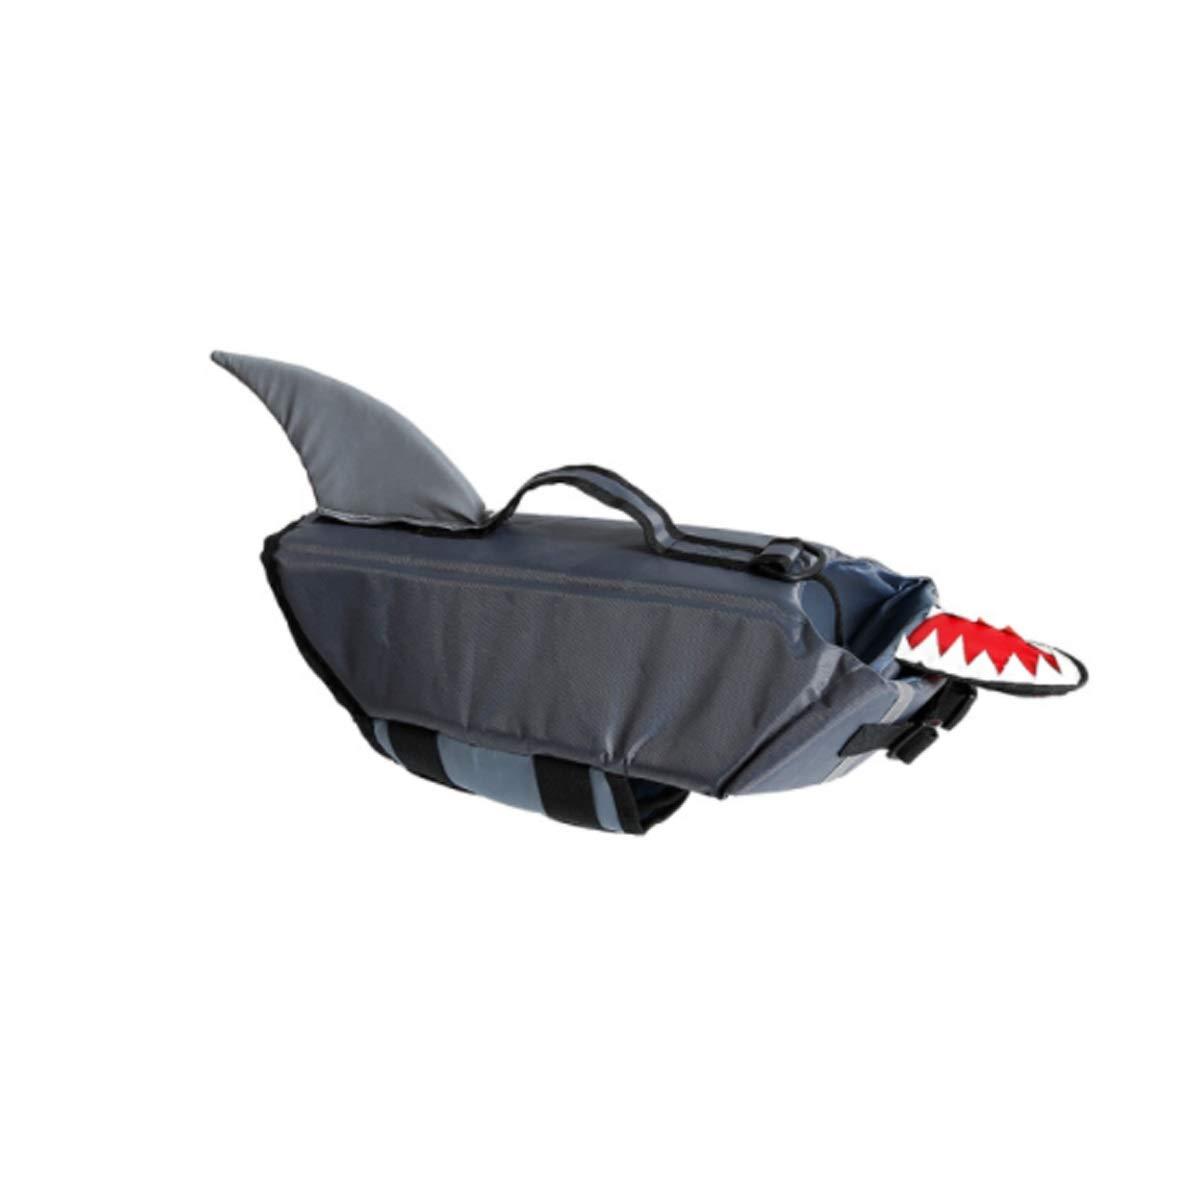 Black MUniversal Swimming Life Jacket, Pet Swimming Vest Clothing (color   Black, Size   M)